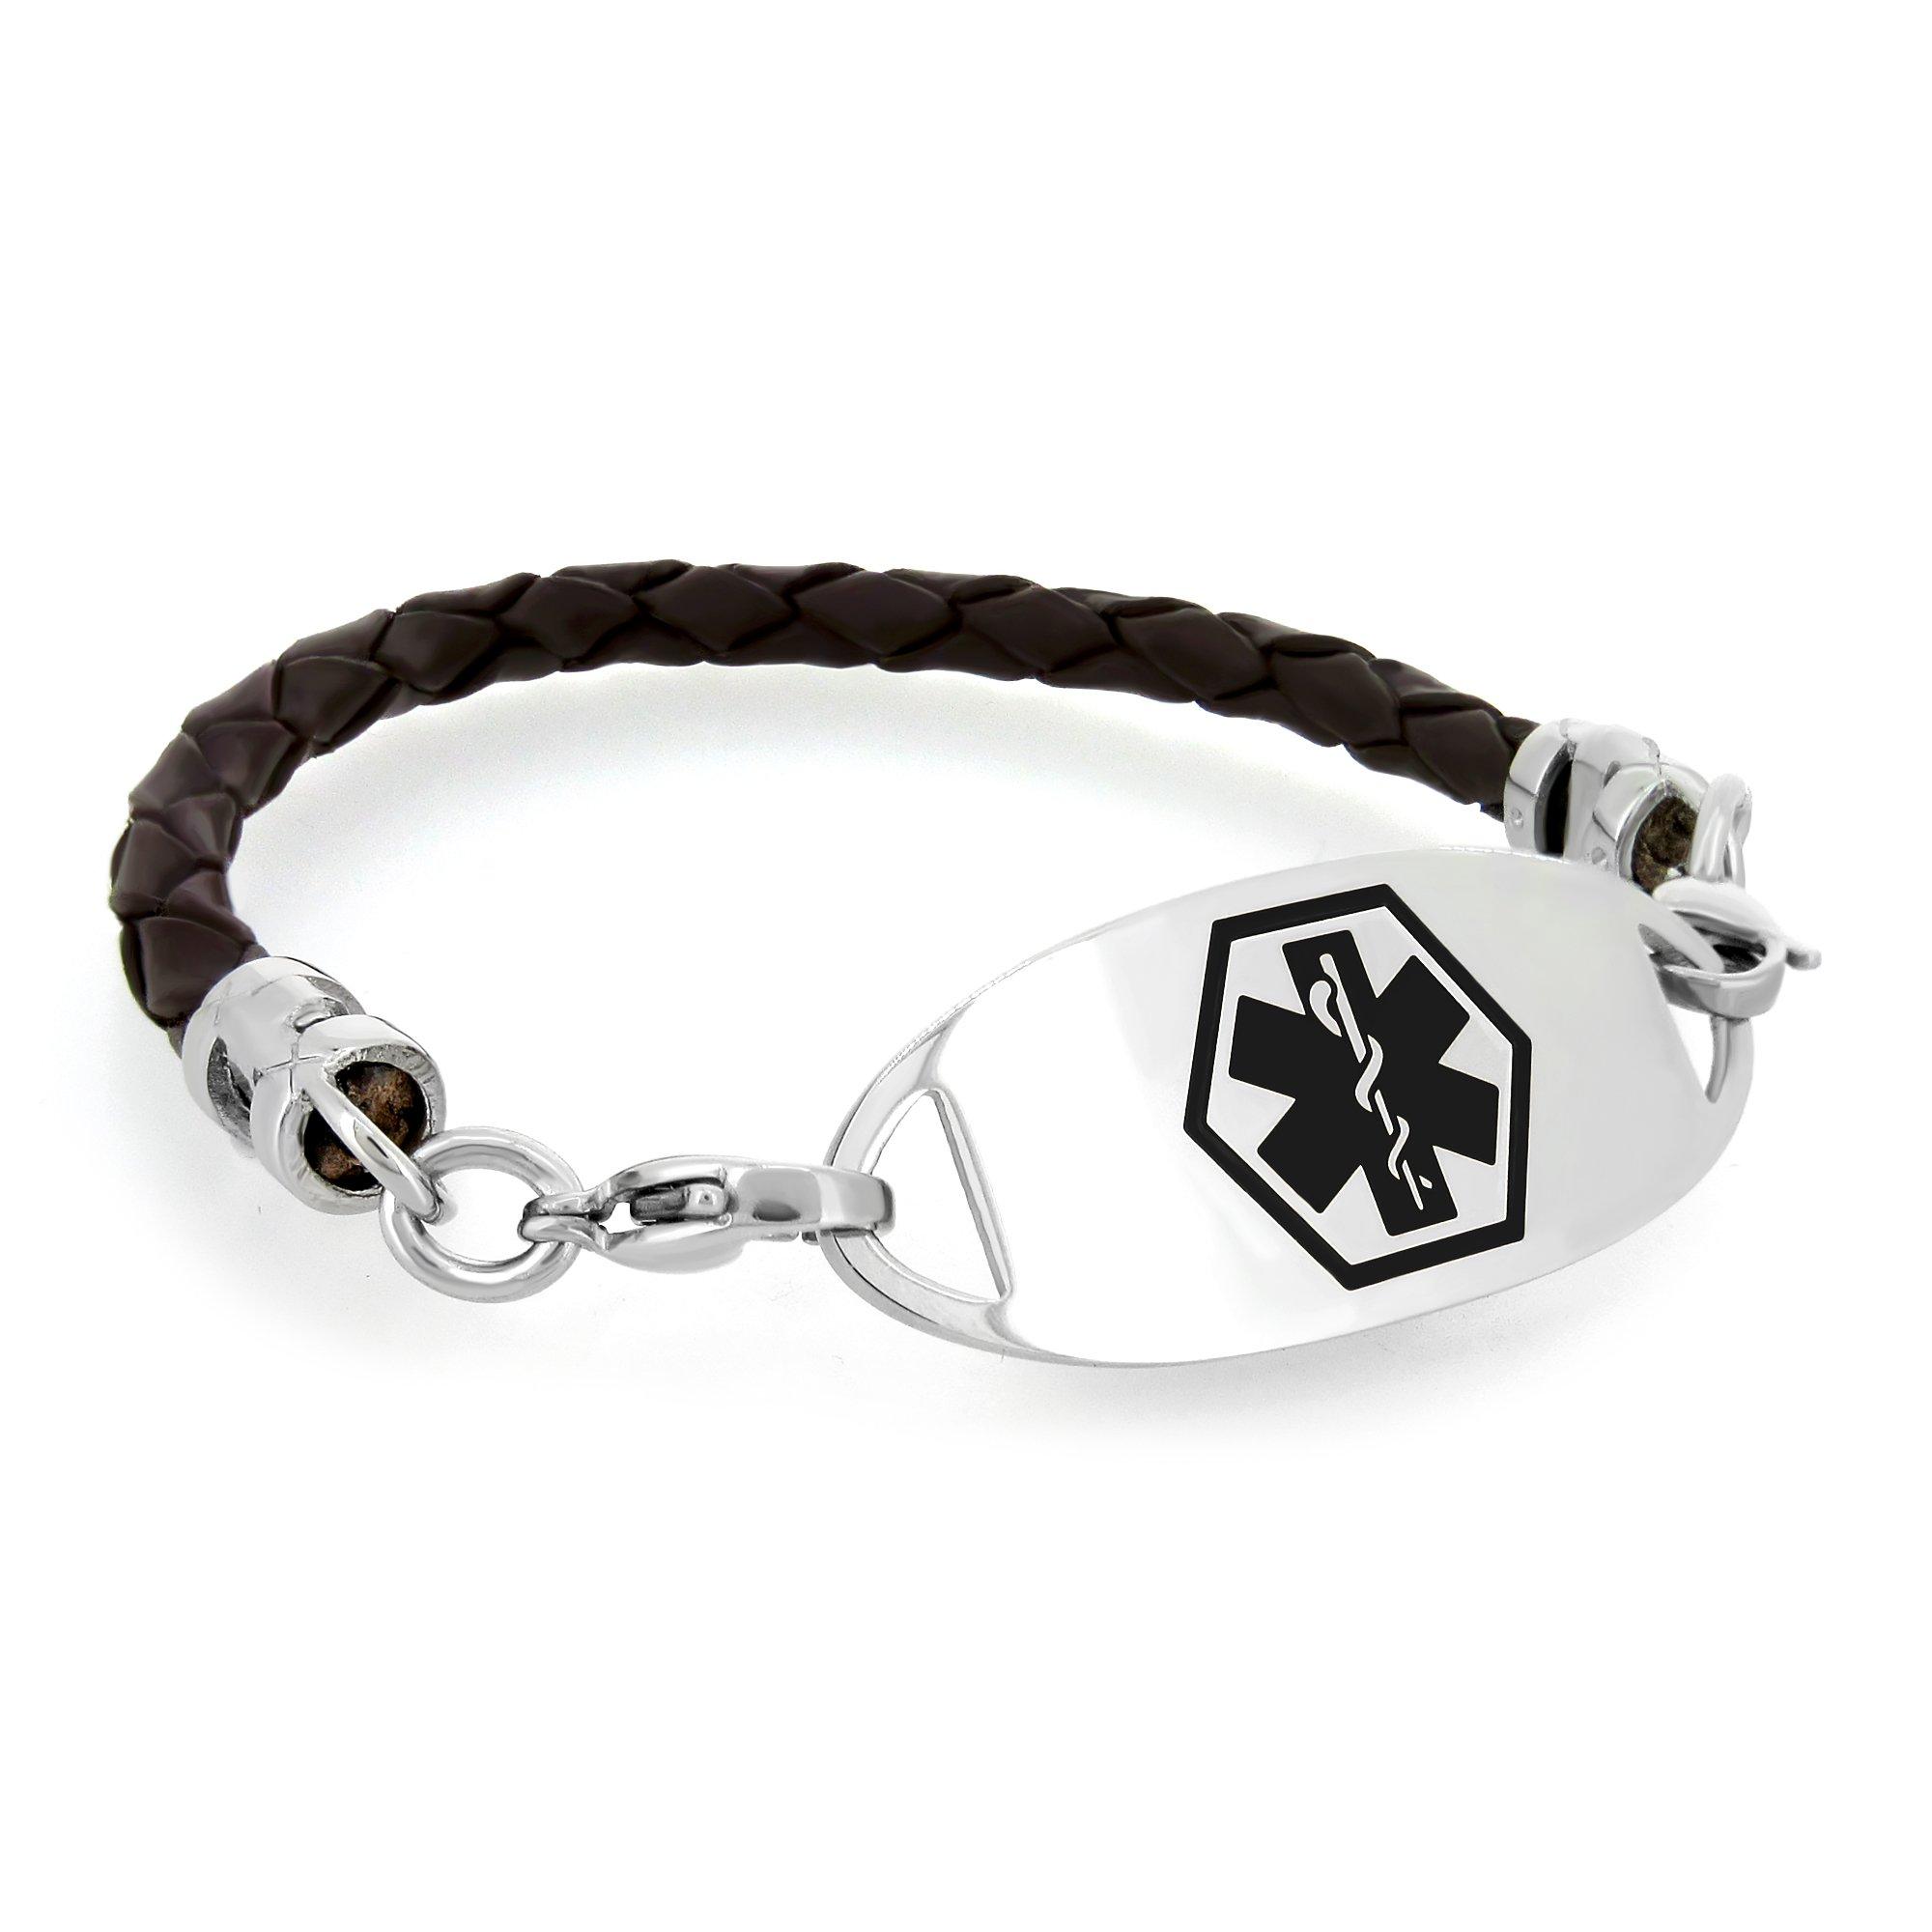 juste prix vente pas cher dernière mode Medical Alert ID Bracelets for Women | MedicEngraved.com